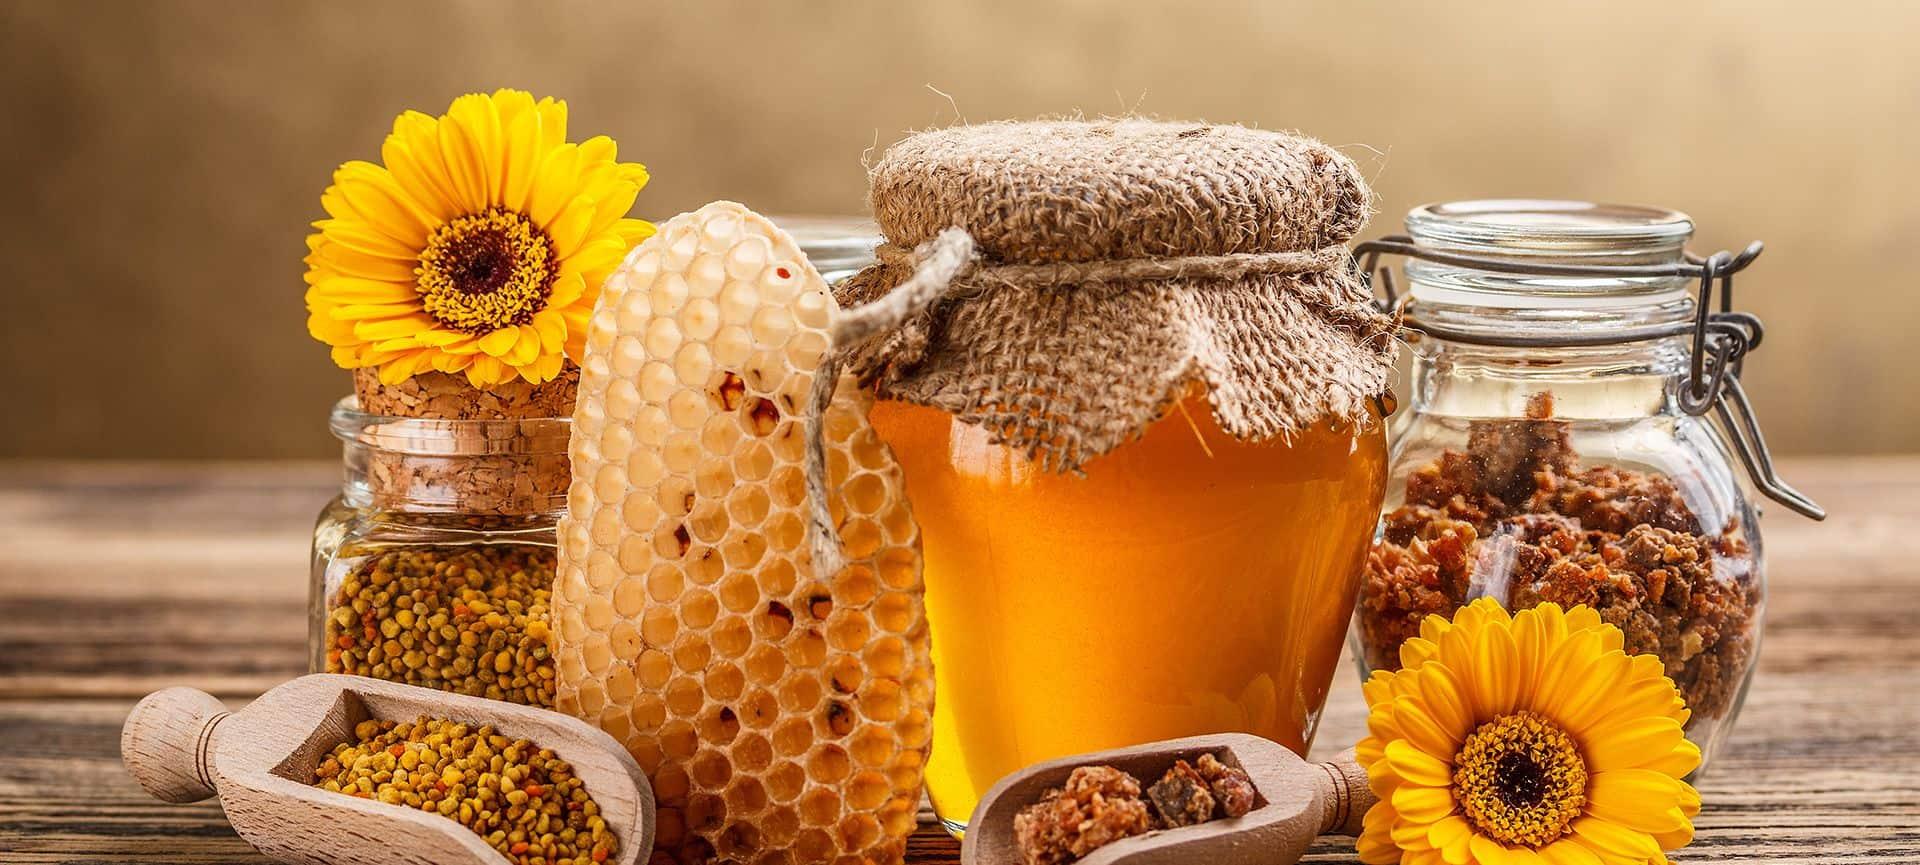 Как выбрать цветочная пыльца